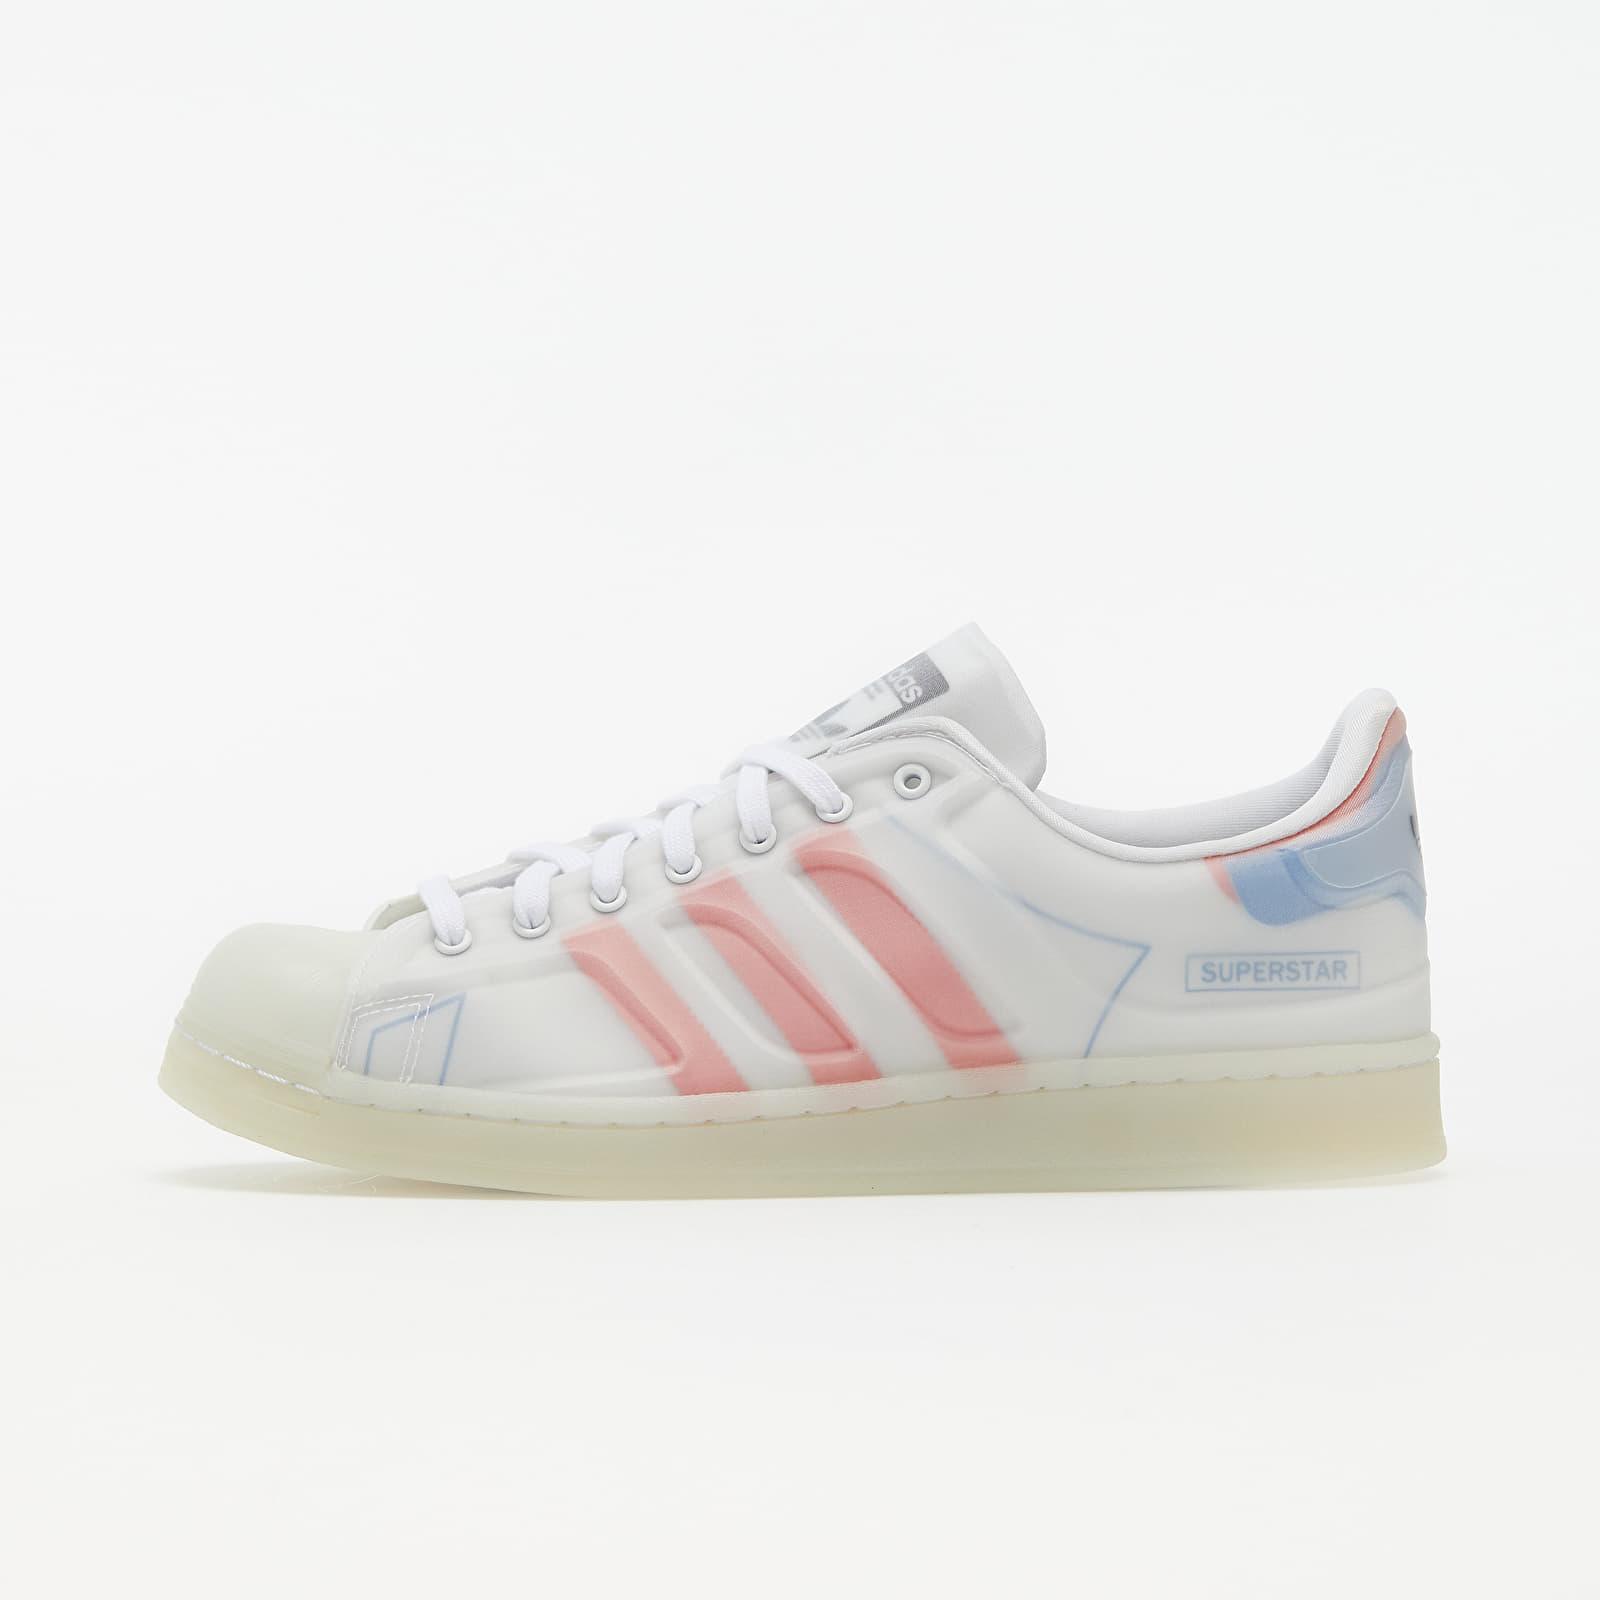 adidas Superstar Futureshell Ftwr White/ Semi Solar Red/ Bright Blue EUR 44